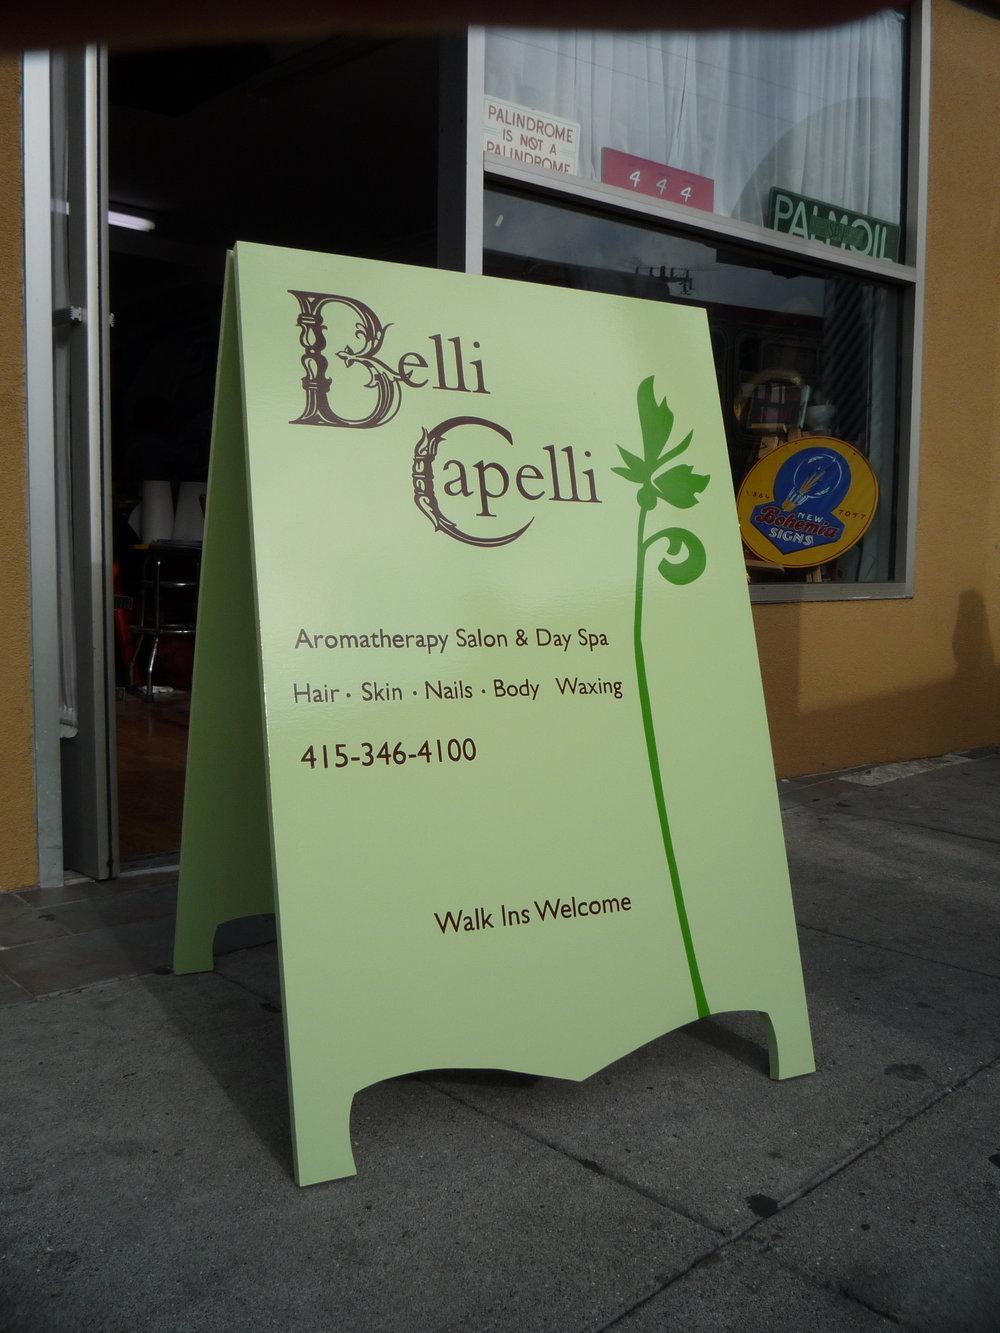 A-FRAME-belli-capelli_4306540375_o.jpg